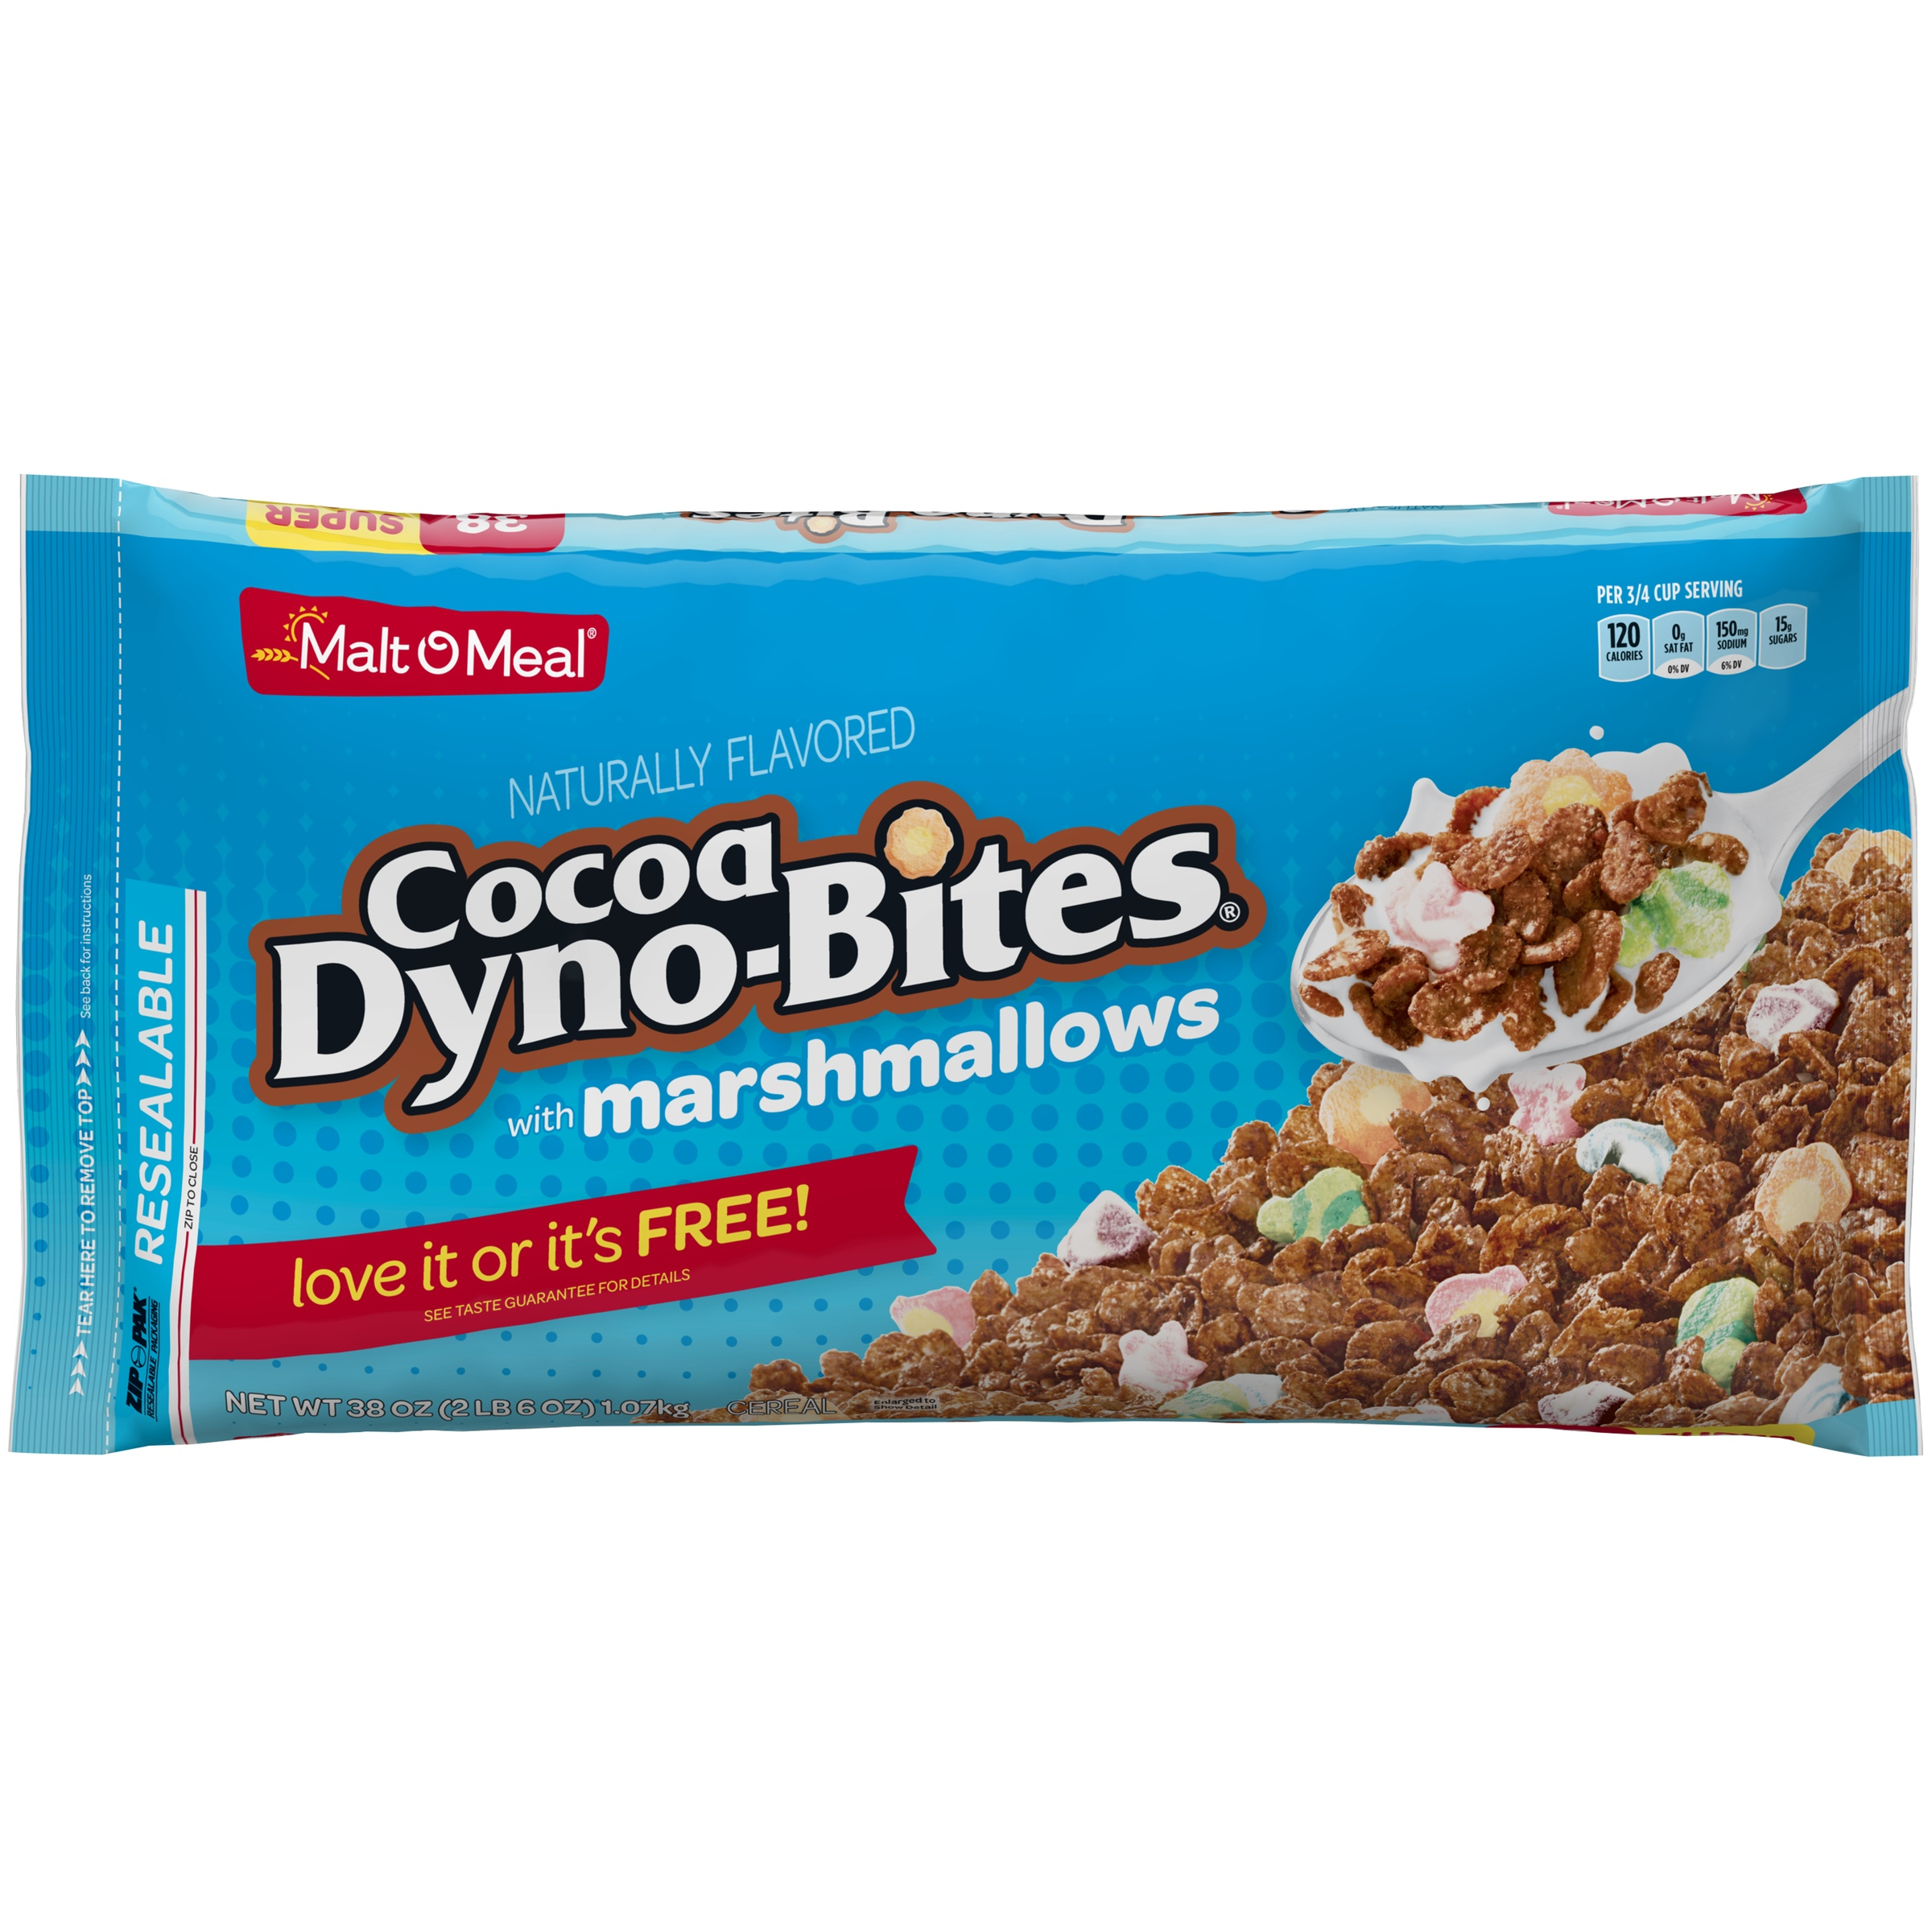 Malt-O-Meal Breakfast Cereal, Coco Dyno-Bites